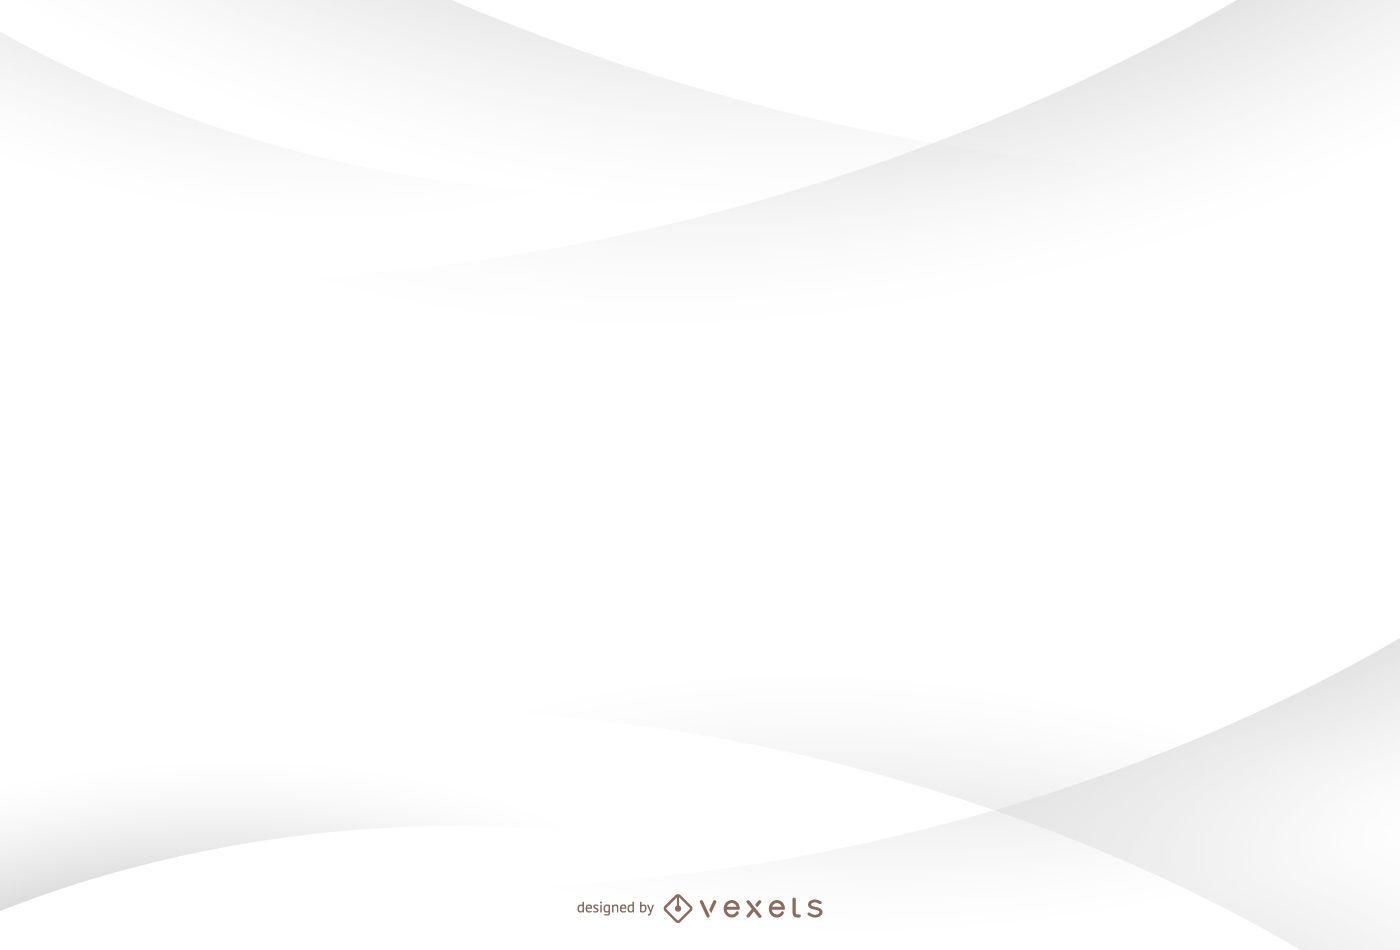 Fondo blanco minimalista con curvas